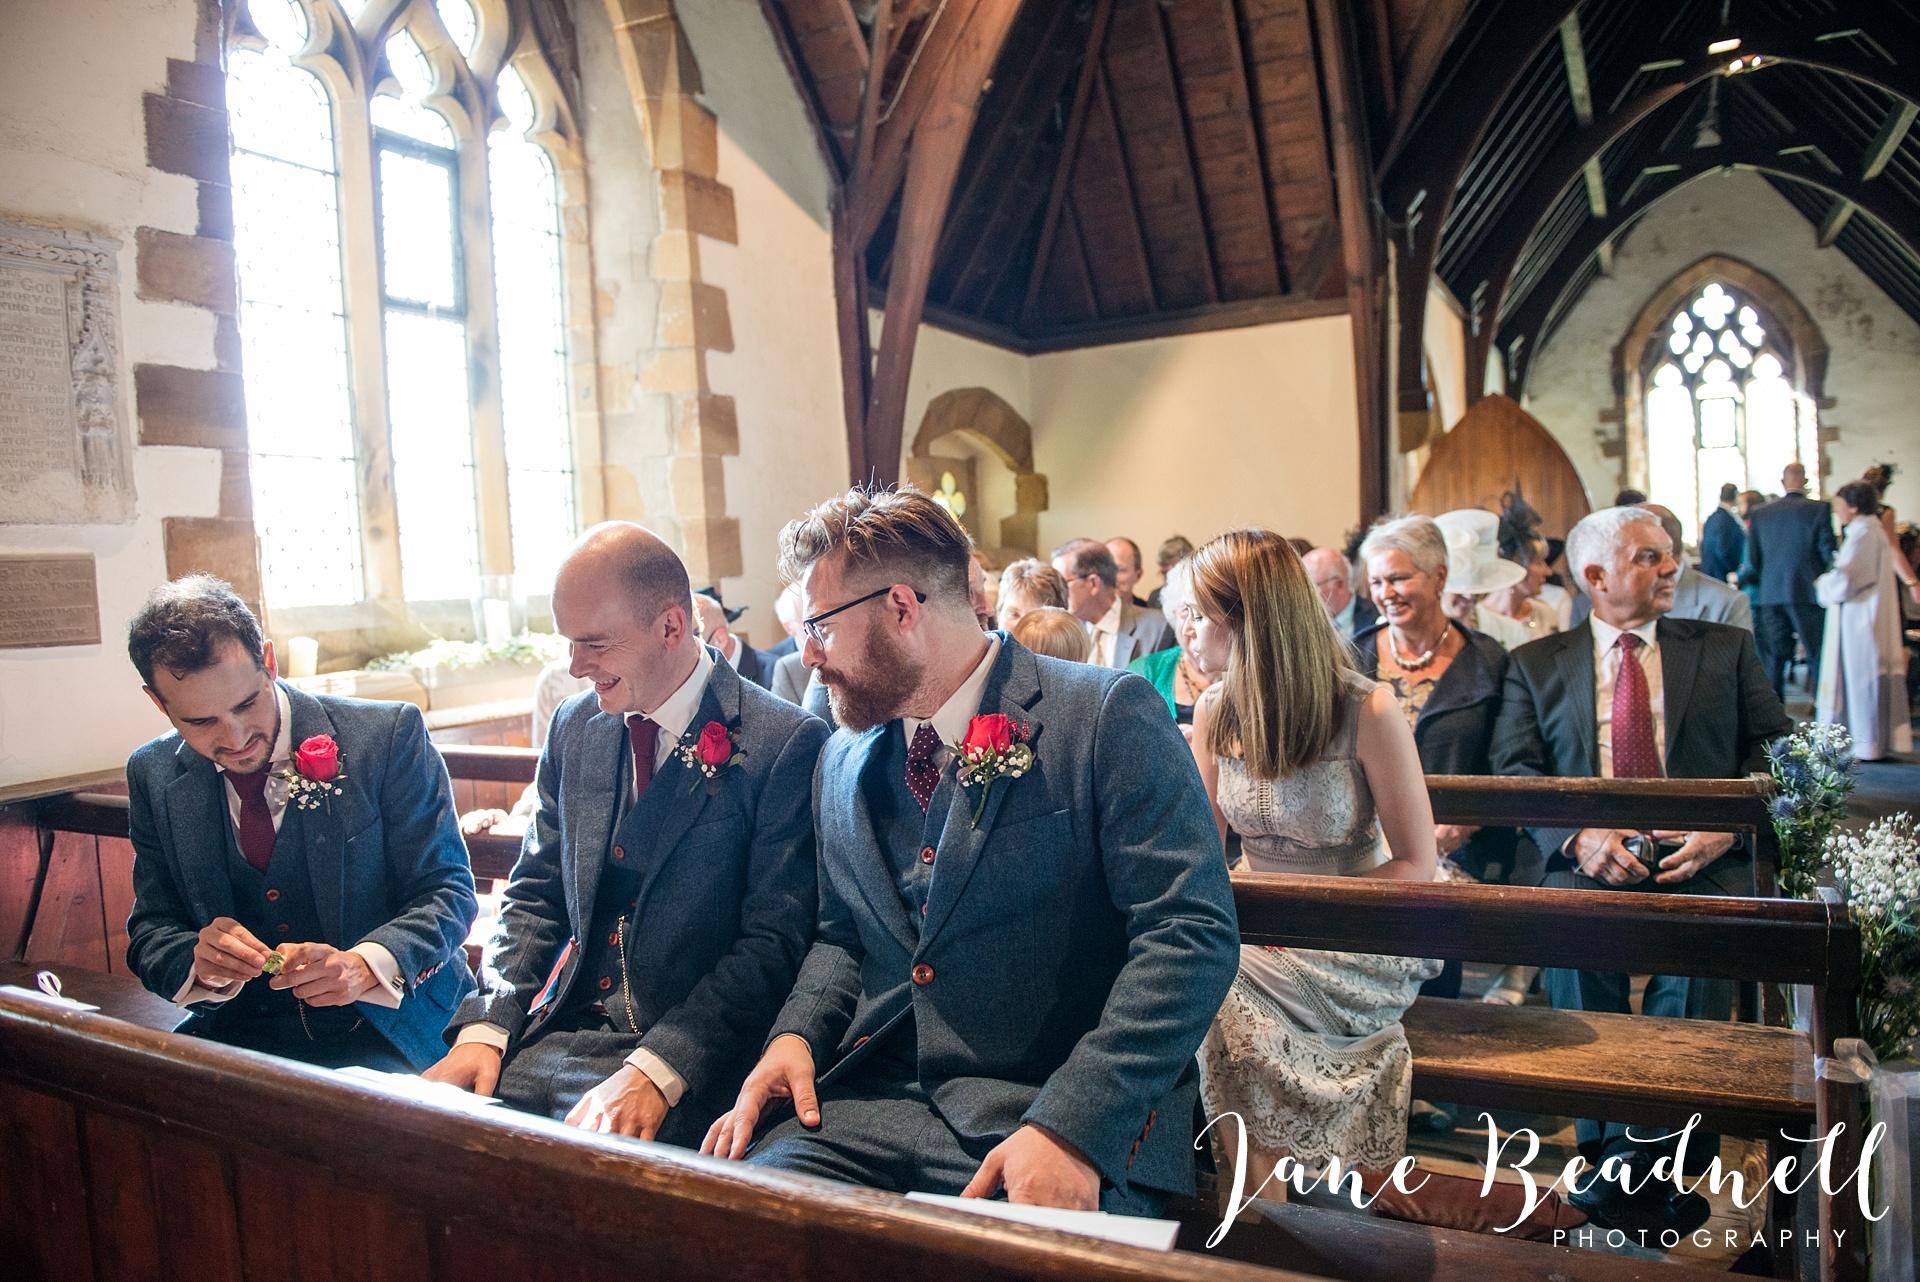 fine-art-wedding-photographer-jane-beadnell-yorkshire-wedding-photographer_0041